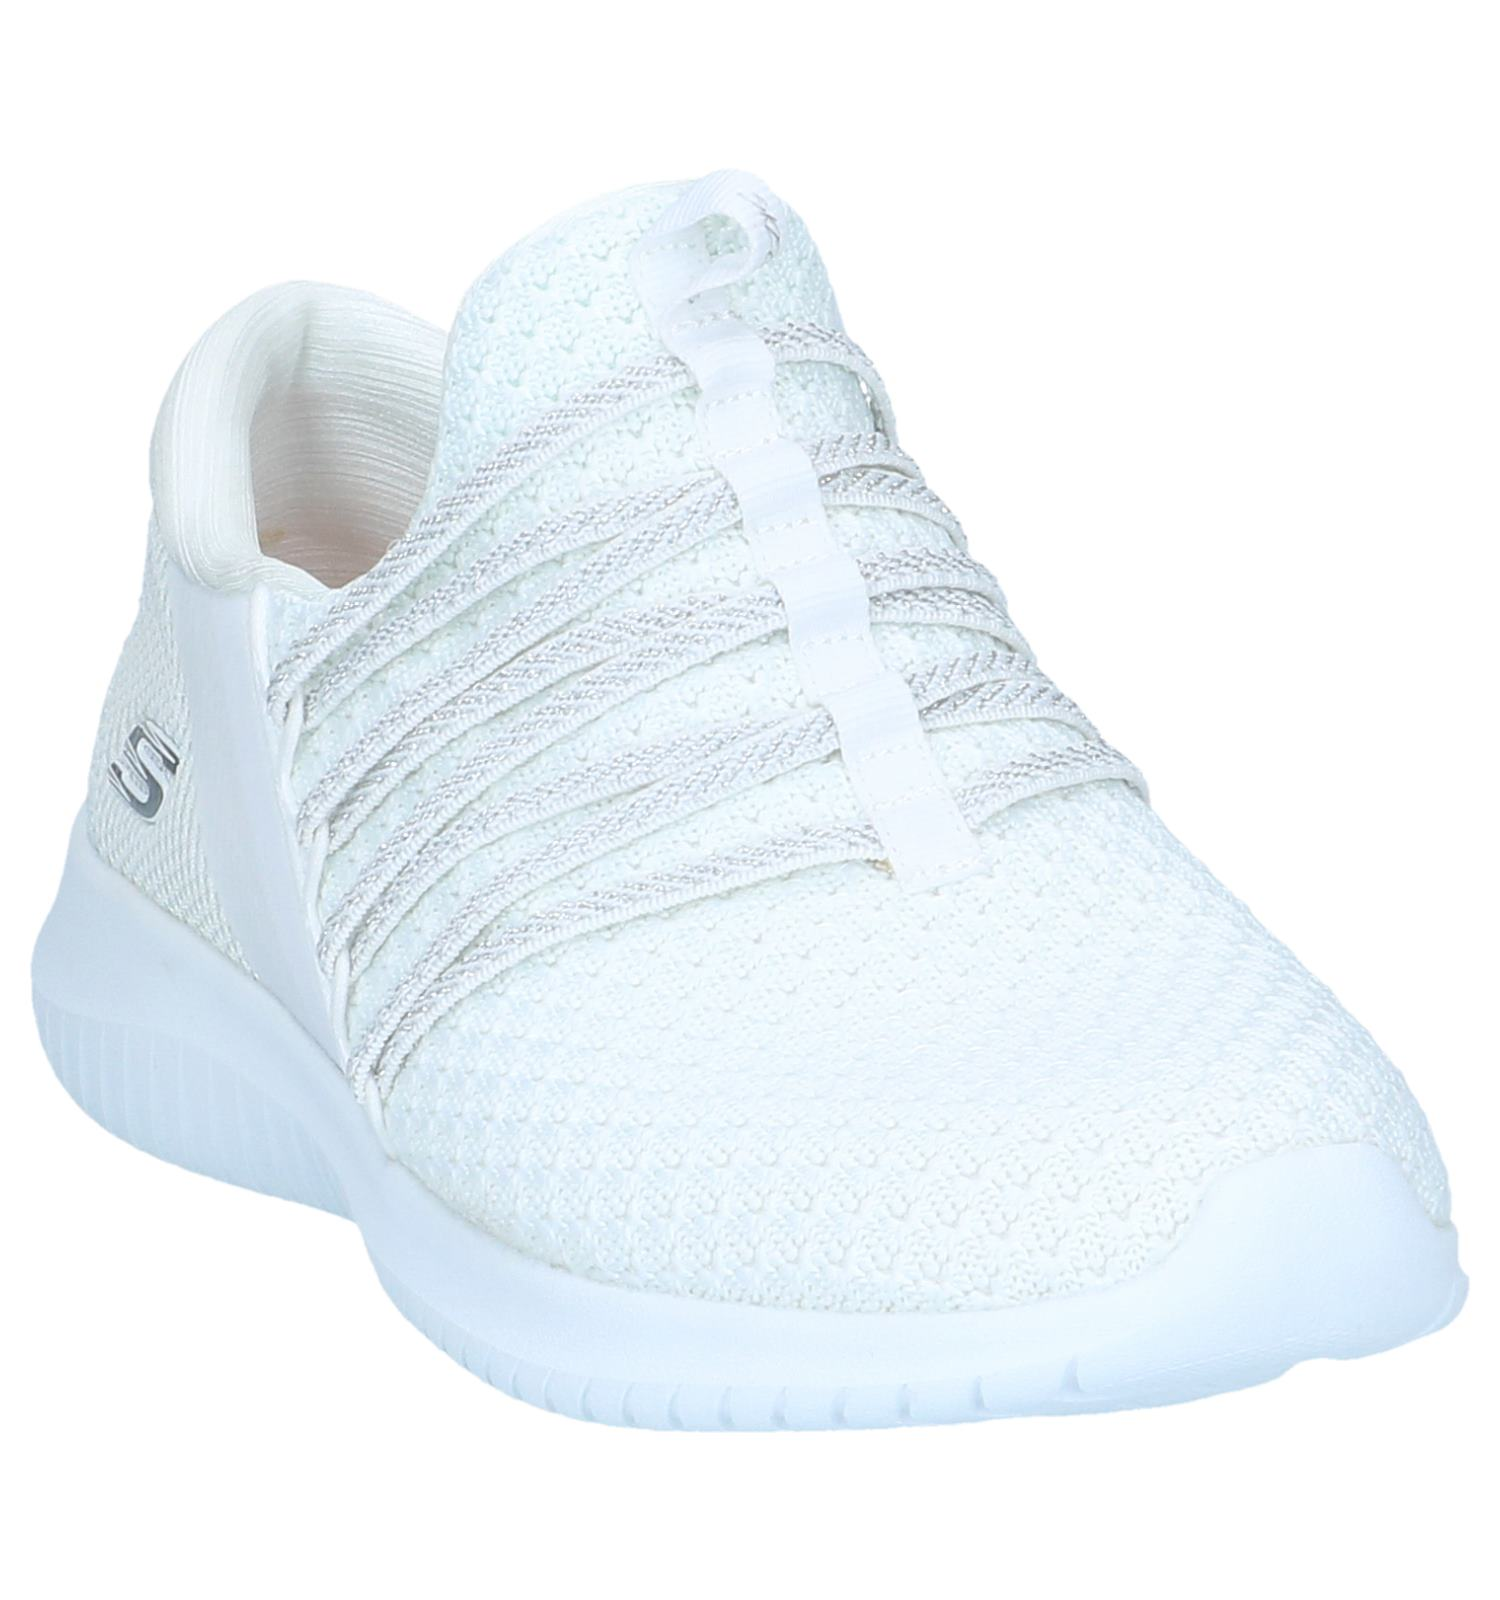 Witte Sneakers Skechers Ultra Flex Bright | TORFS.BE